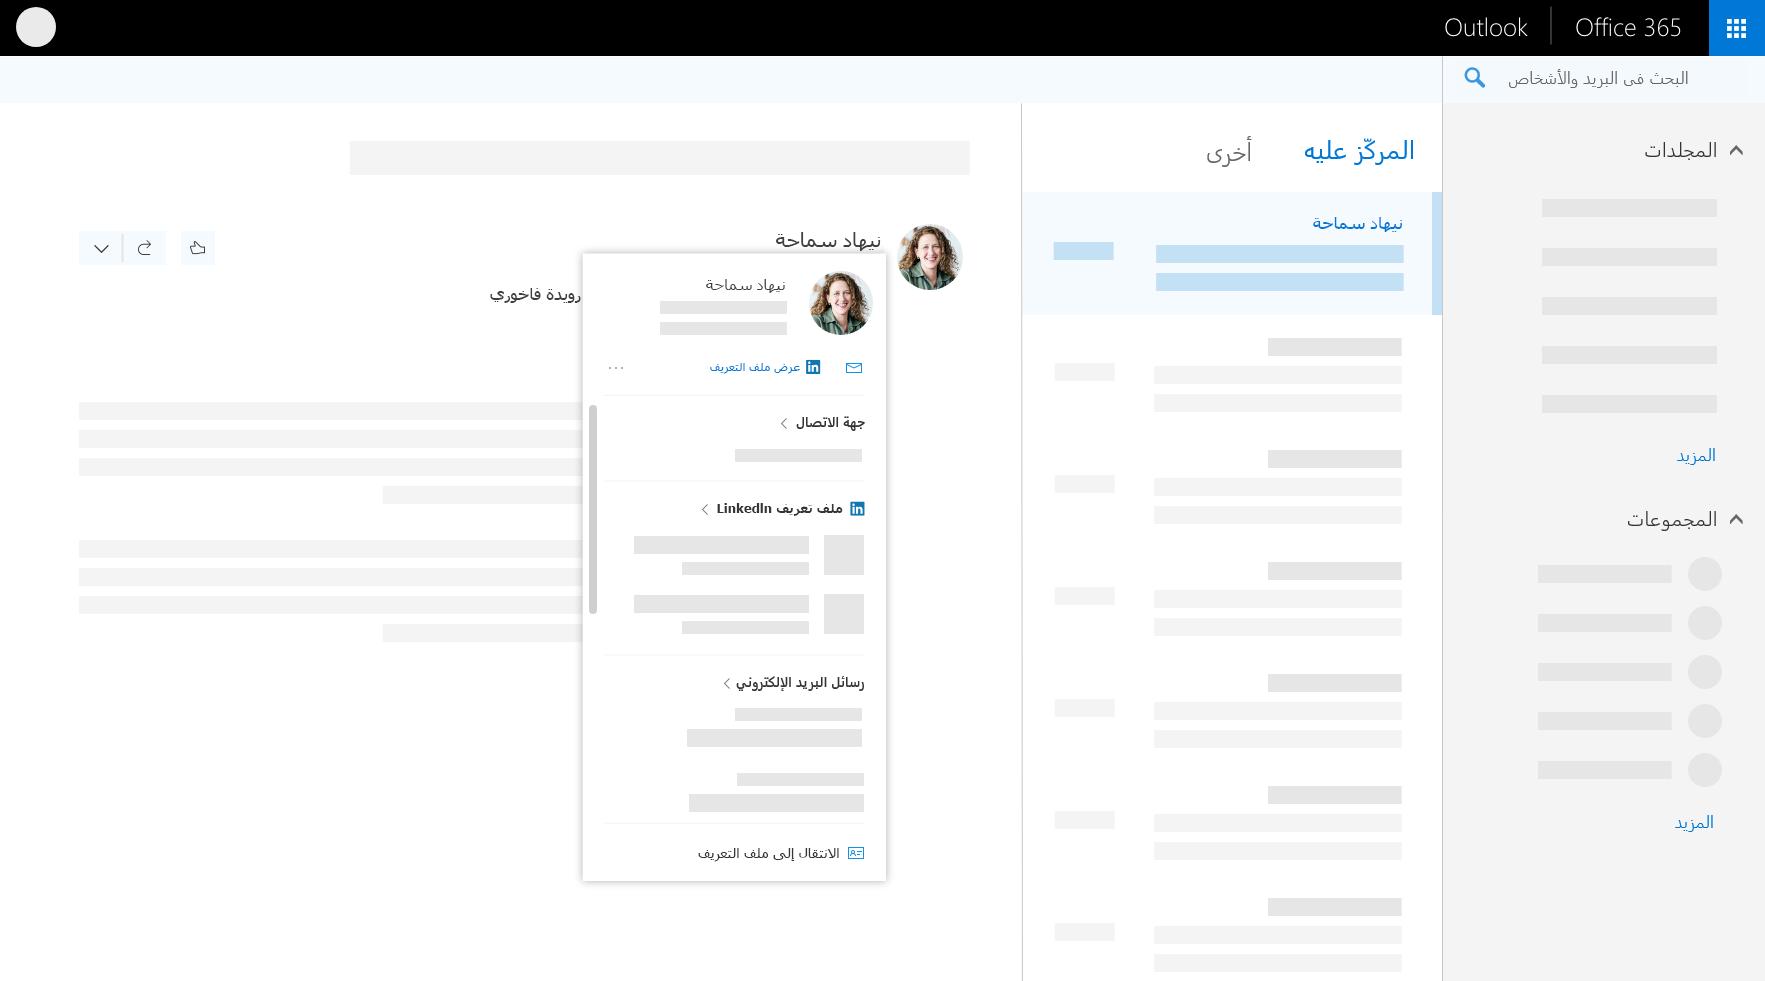 بطاقه ملف تعريف في Outlook علي ويب